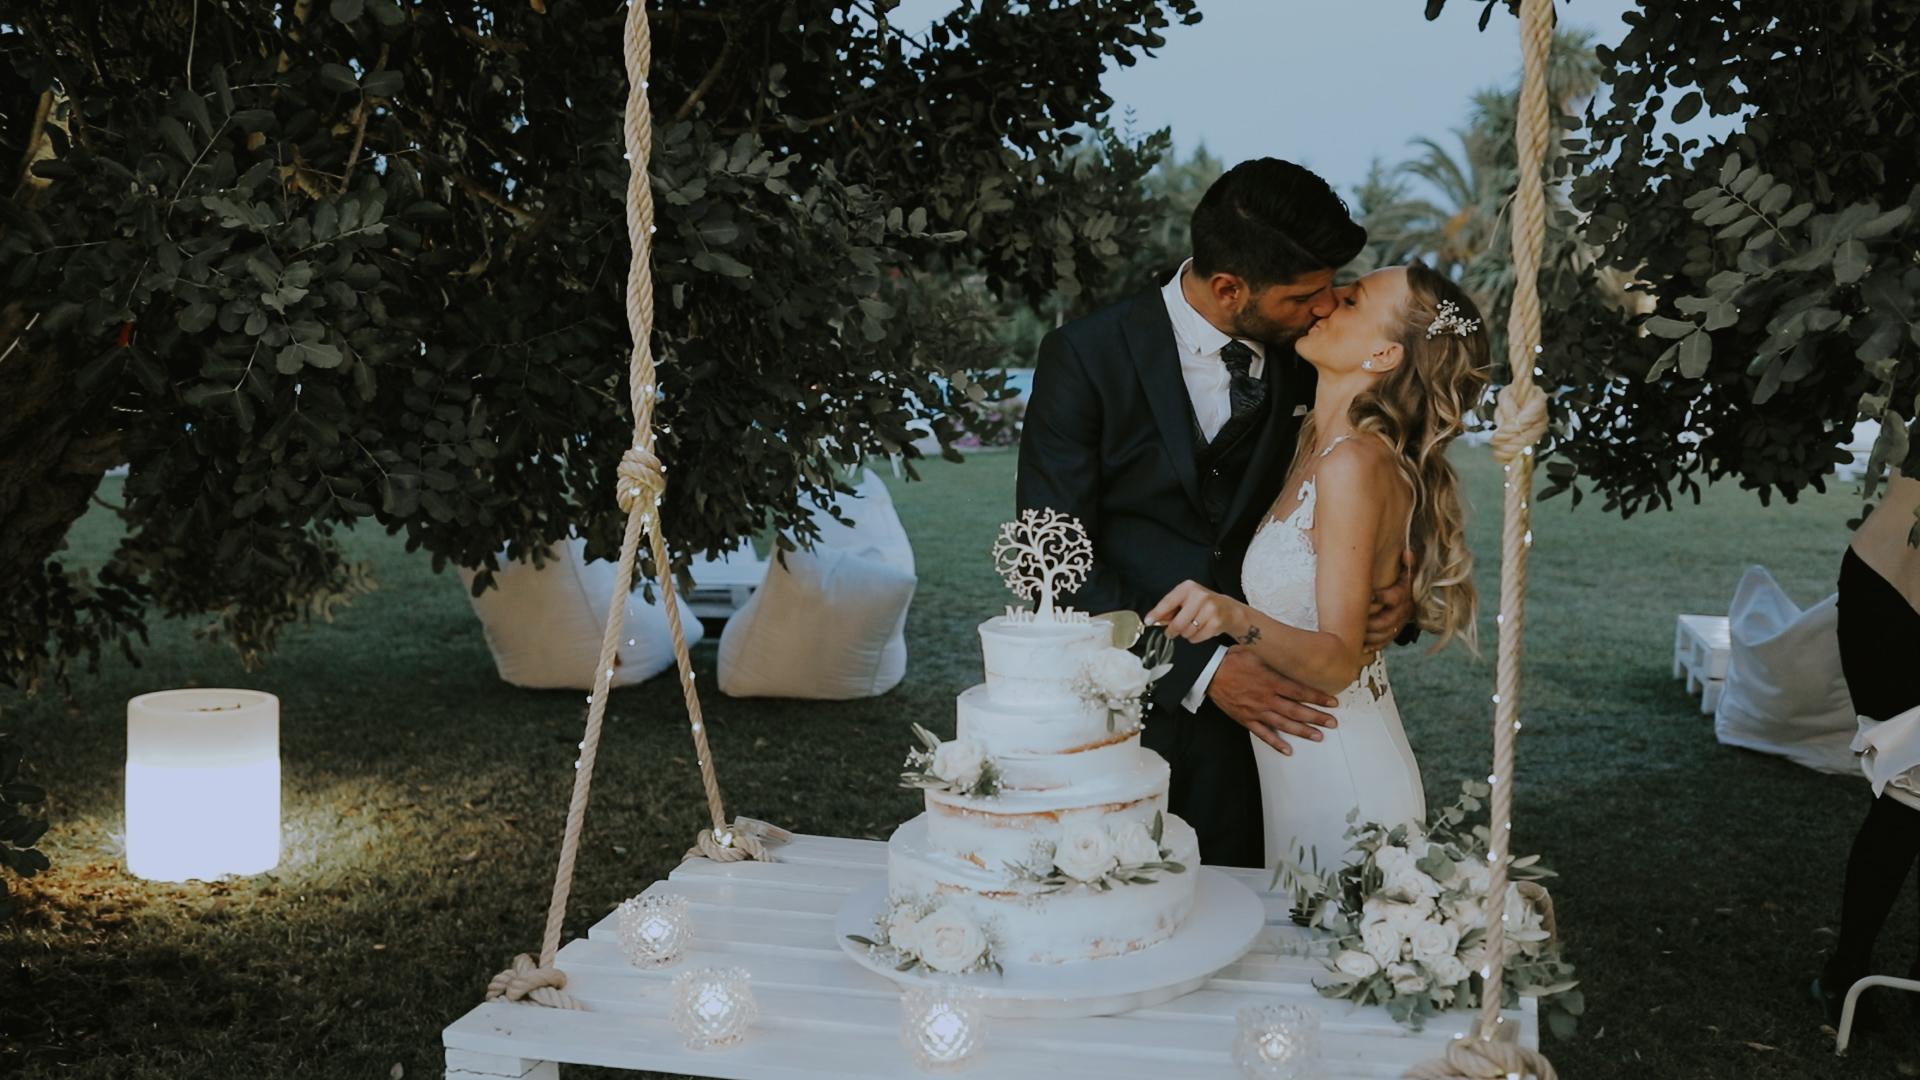 FILM.00_01_58_14.Immagine005-1 Matrimonio a Masseria Pietrafitta